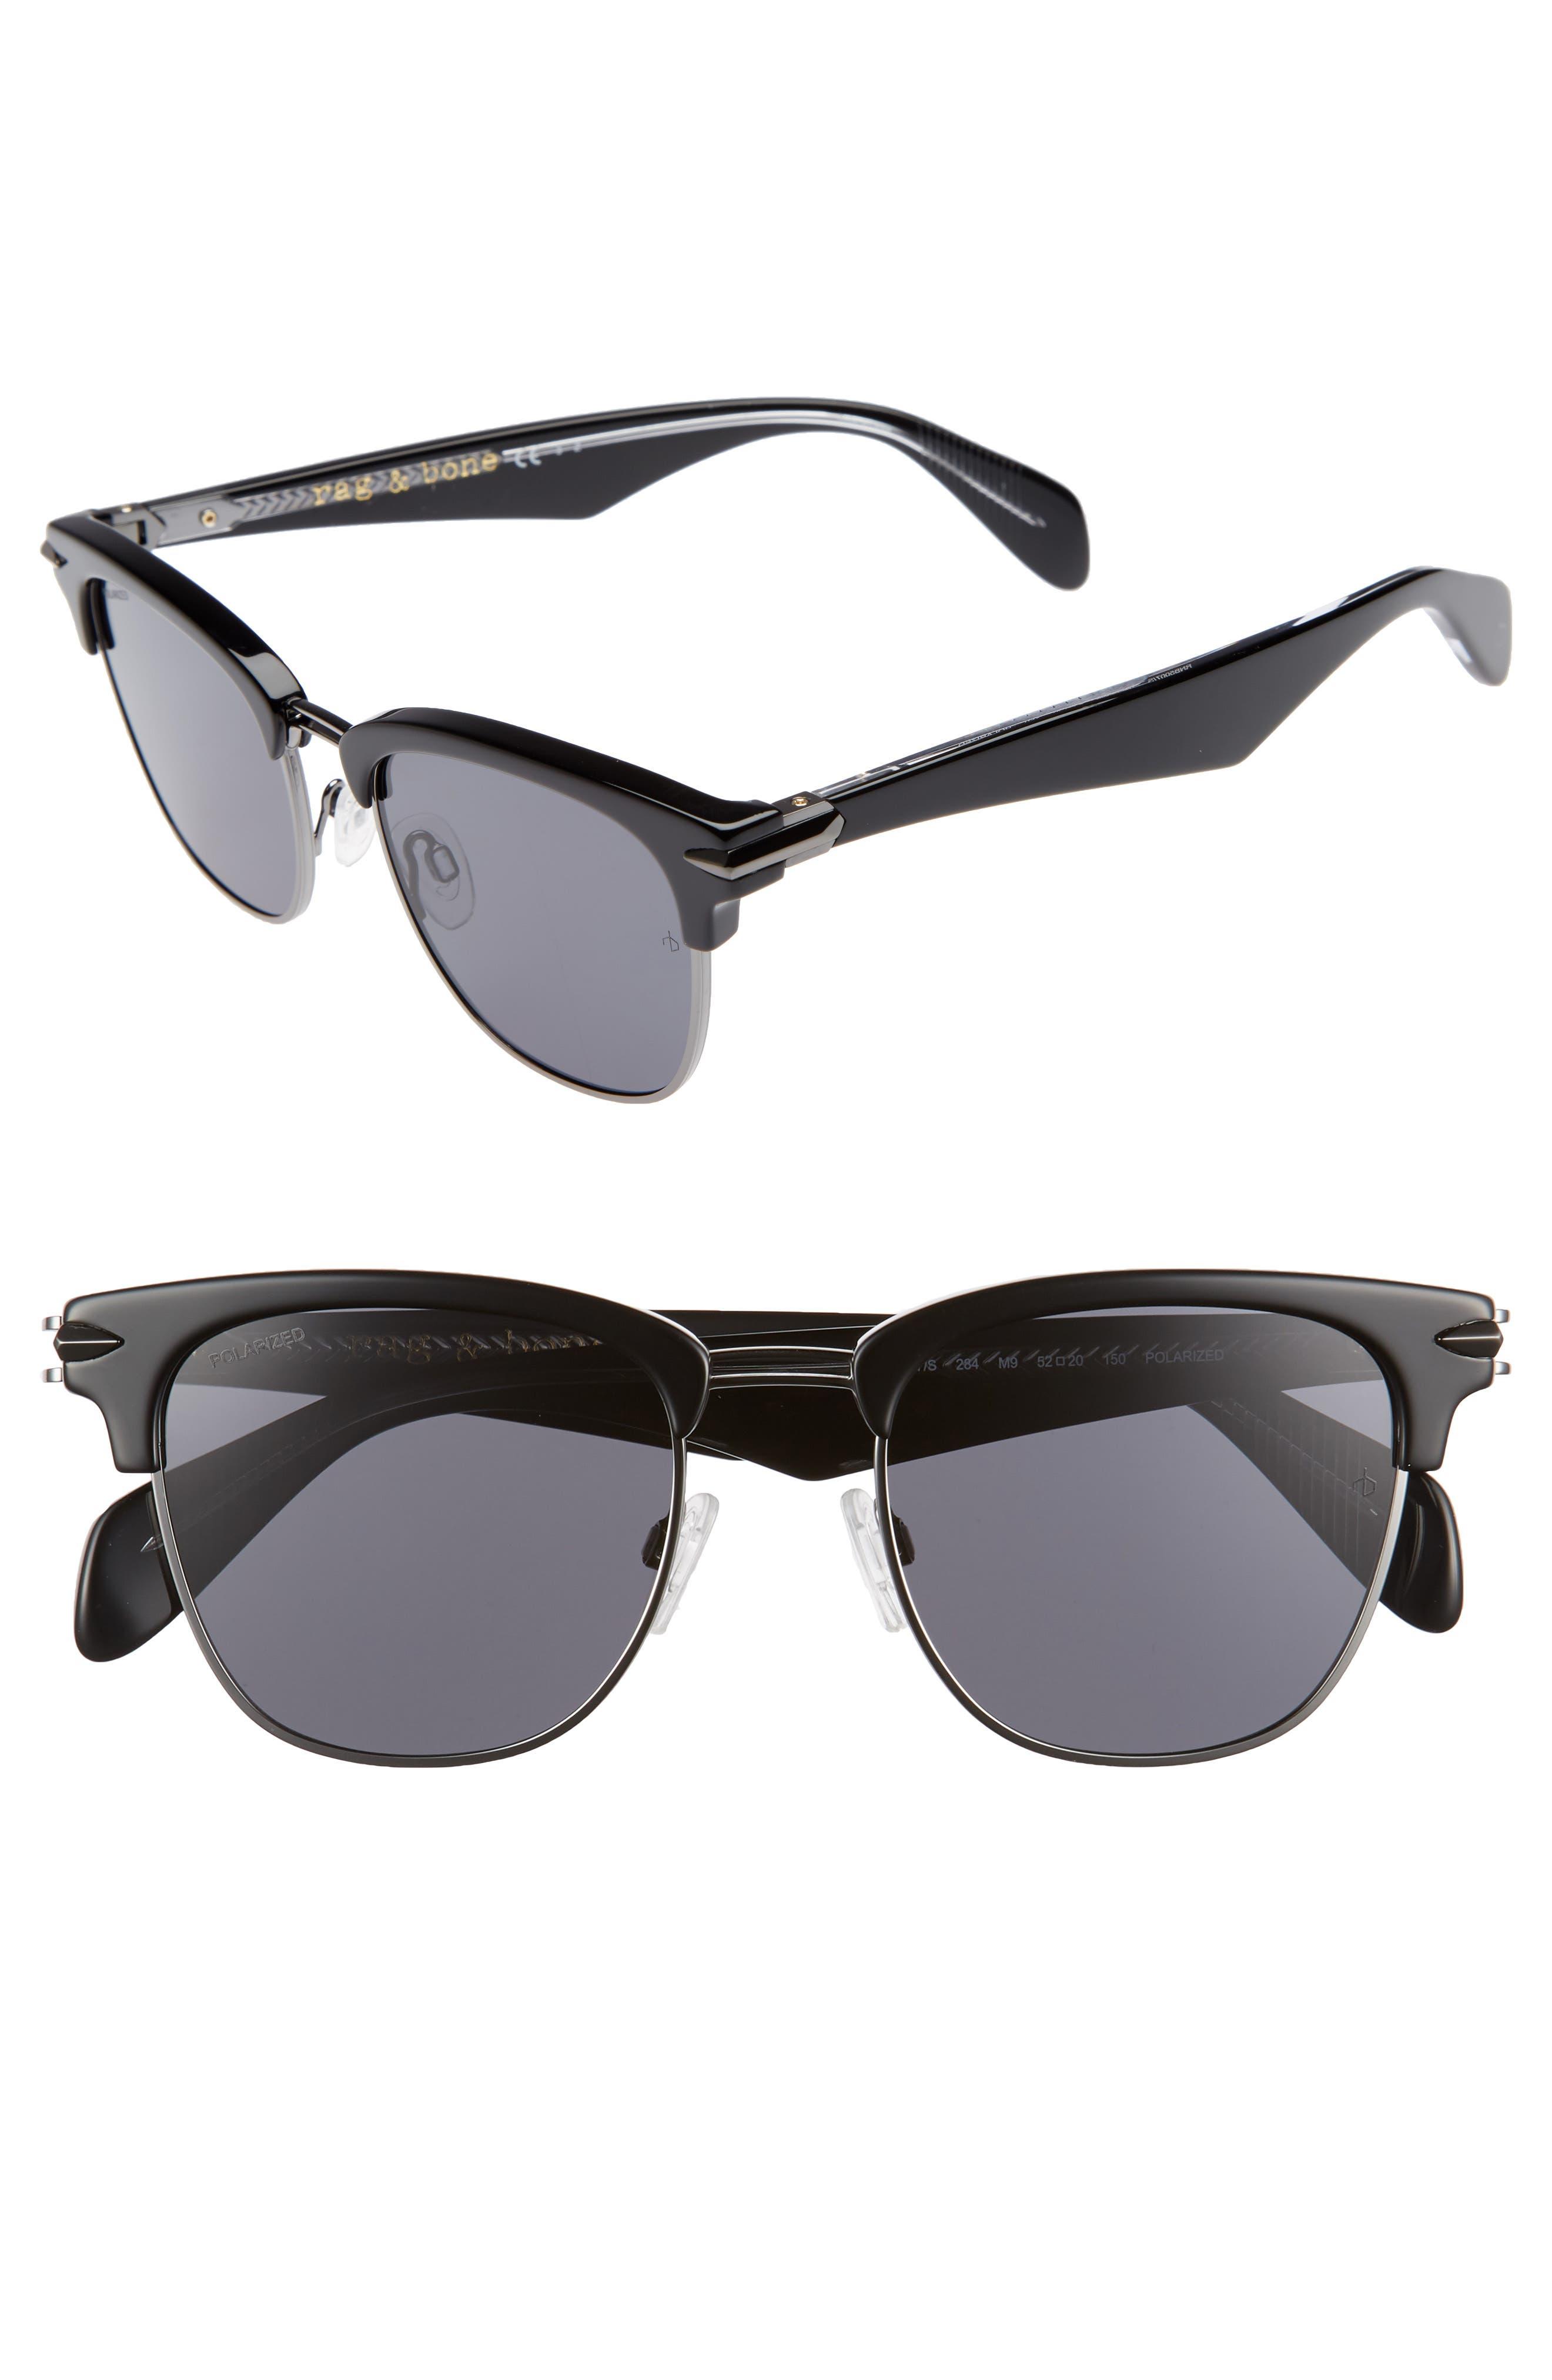 52mm Polarized Sunglasses,                         Main,                         color, Black Ruth/ Polar